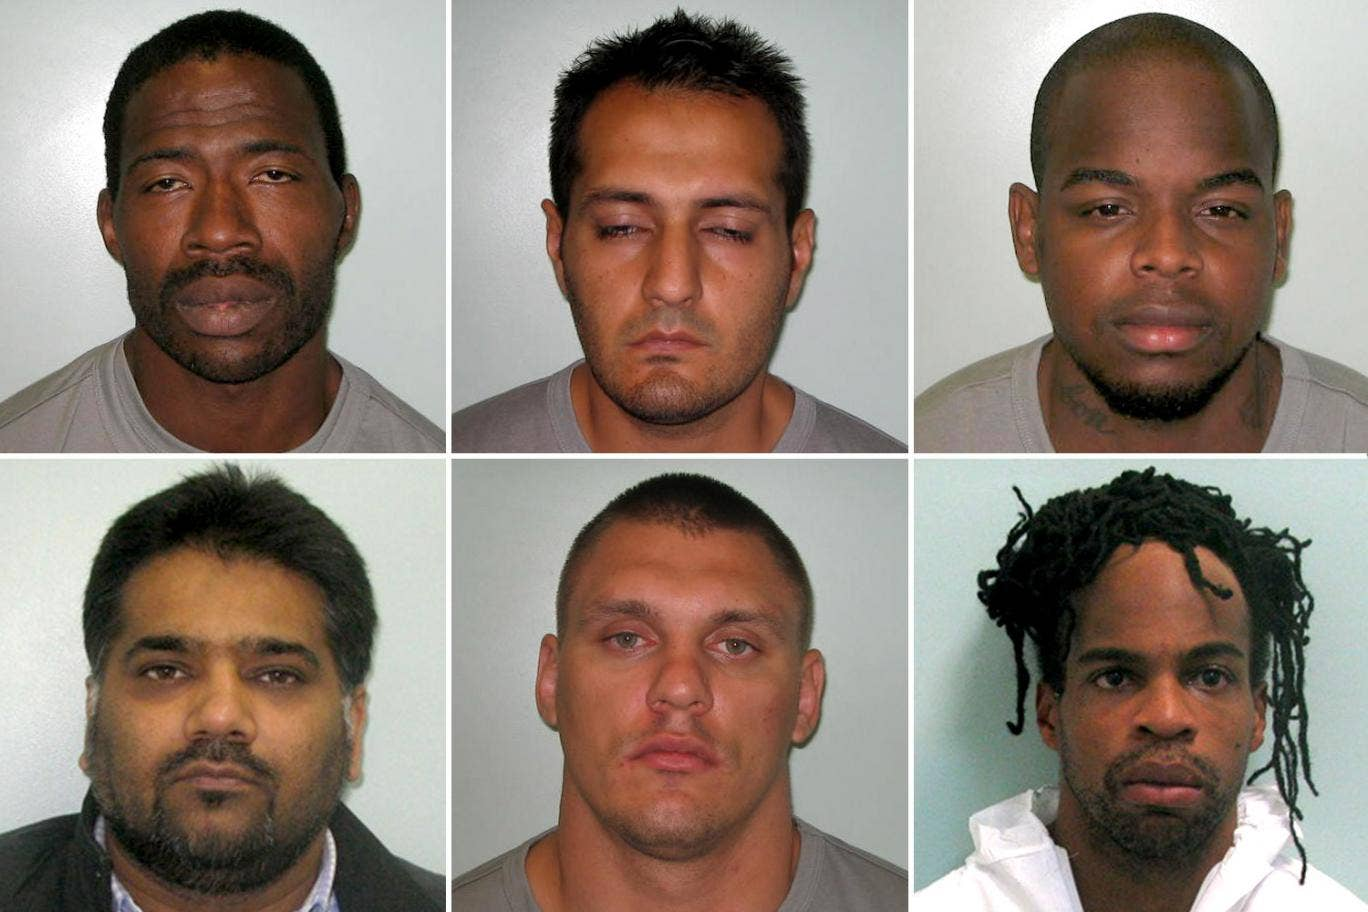 The jailed robbers, top row (l-r): David Sadiku, Aamir Kayani, Michael Carbon; bottom row (l-r): Amarjeet Bharj, Paulius Strasunskas, Francis Carbon